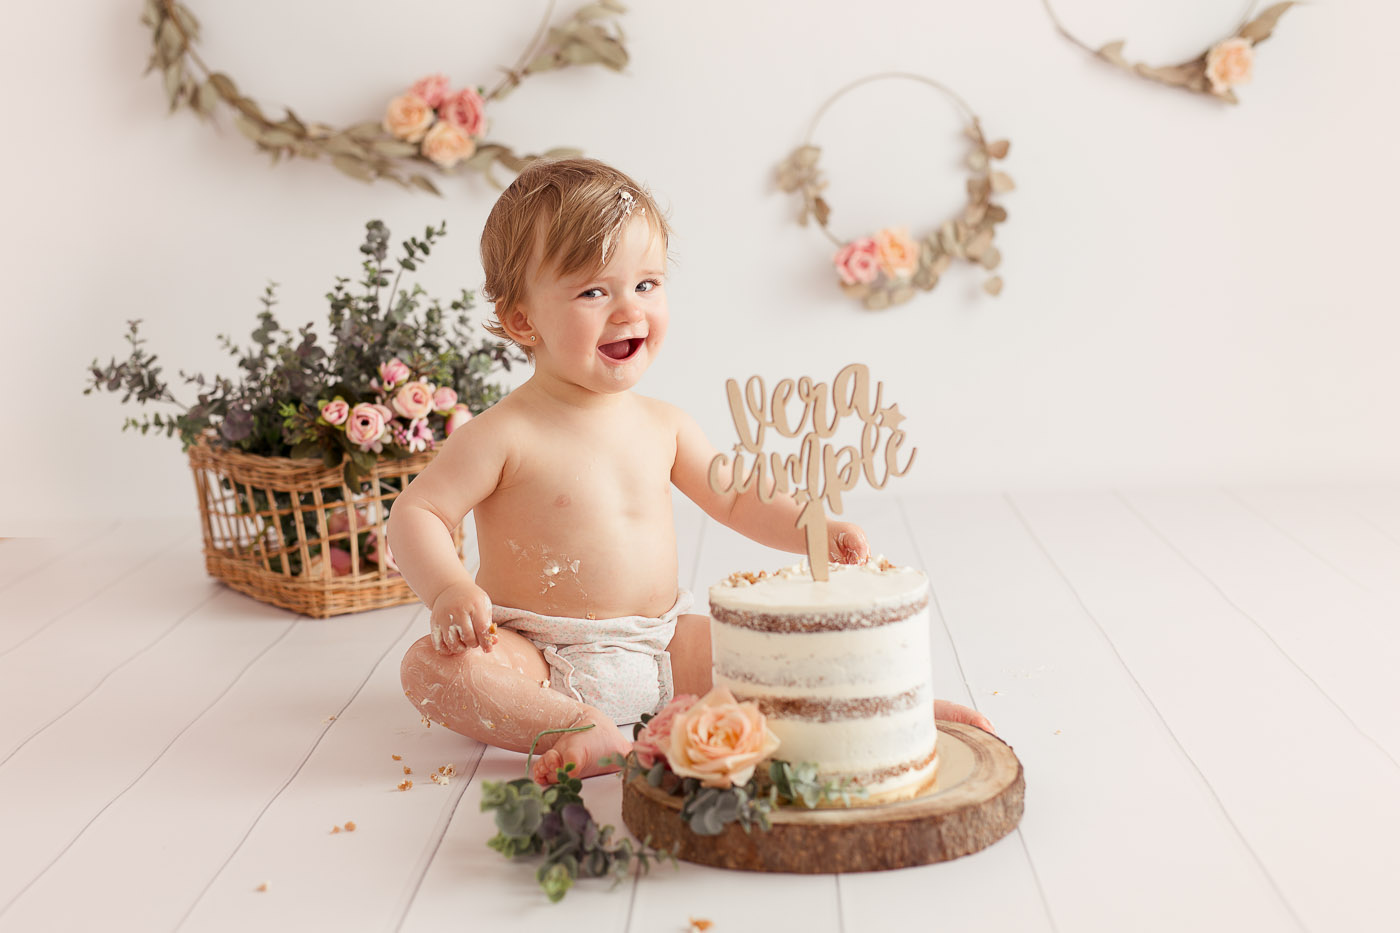 fotografo primer cumpleaños santander cantabria